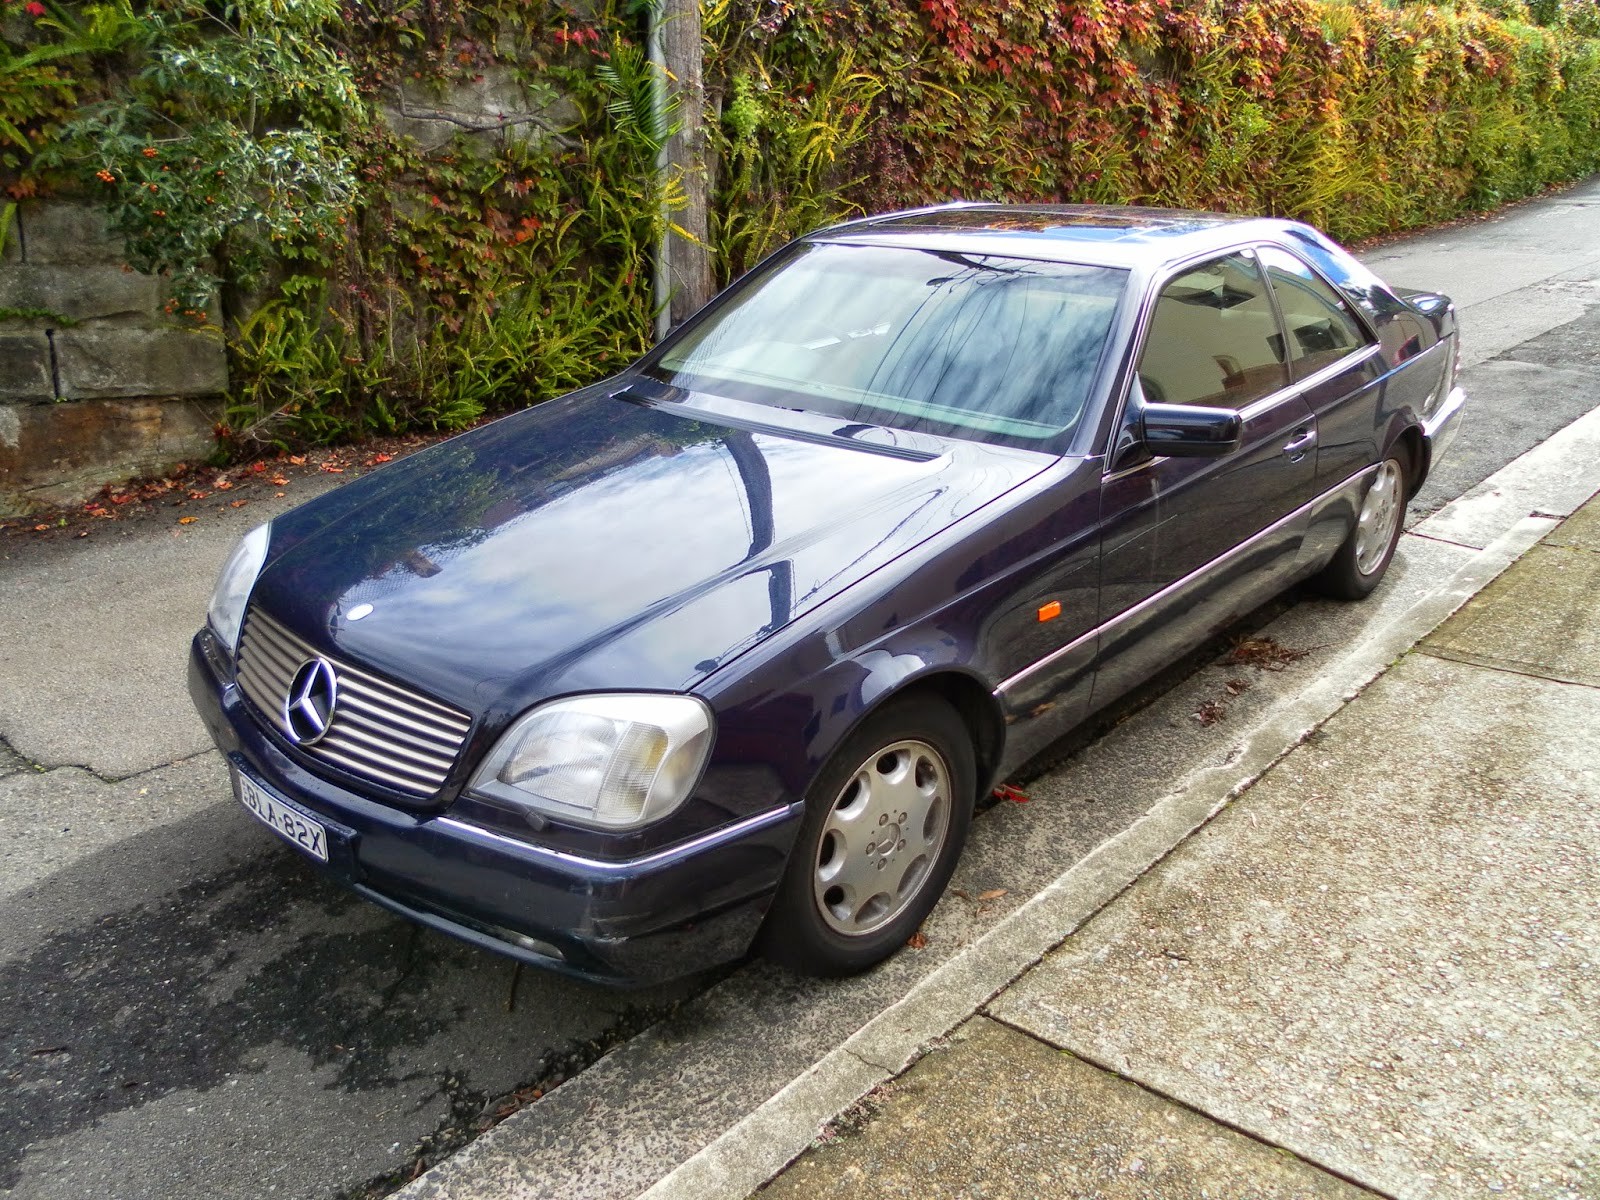 aussie old parked cars 1996 mercedes benz c140 s 500 coupe. Black Bedroom Furniture Sets. Home Design Ideas